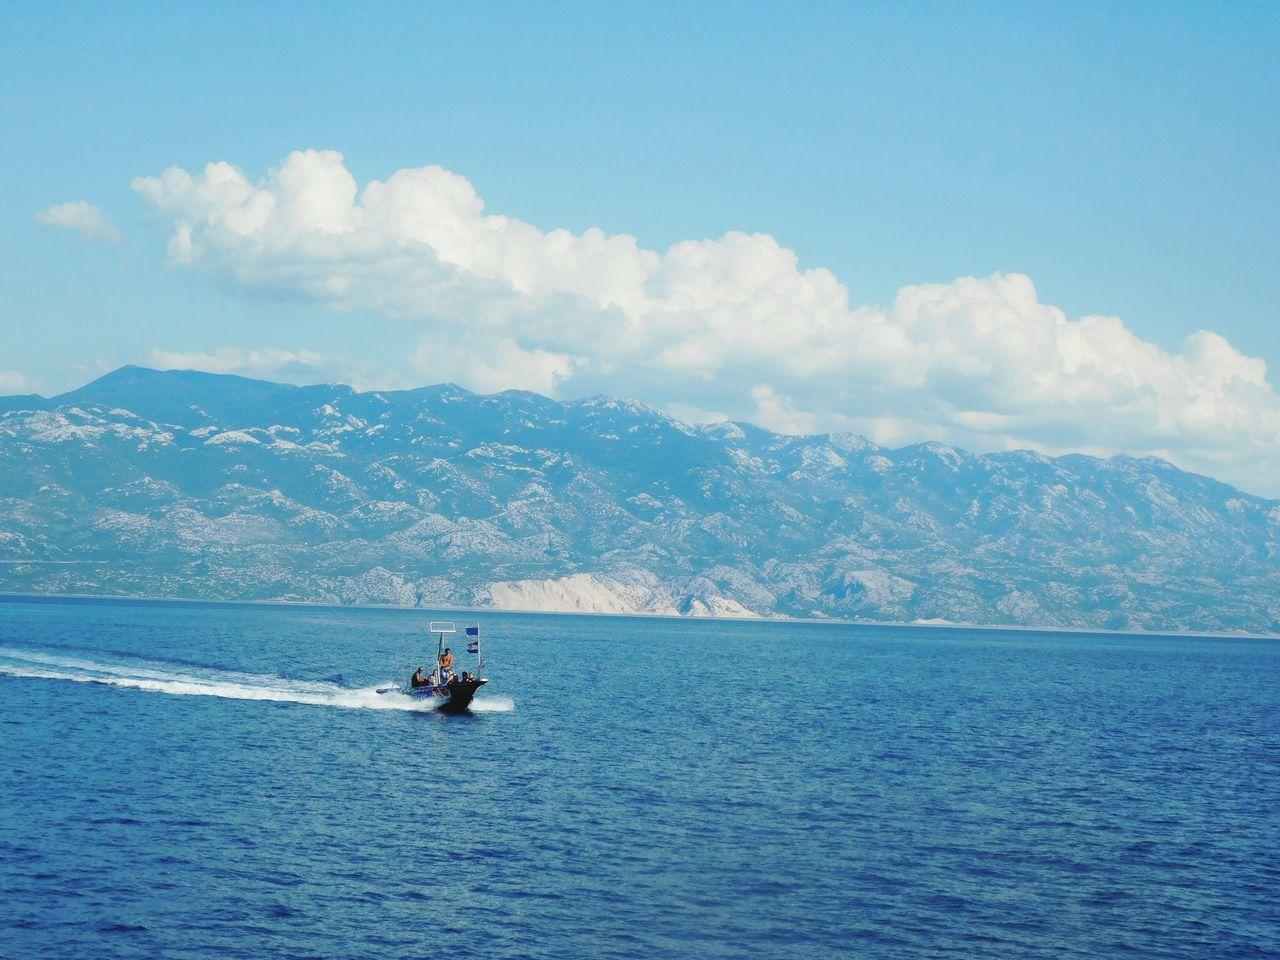 Sea And Sky Sea Seaside Boat Croatia Krk Island Crikvenica Freedom Freelance Life Adriatic Sea